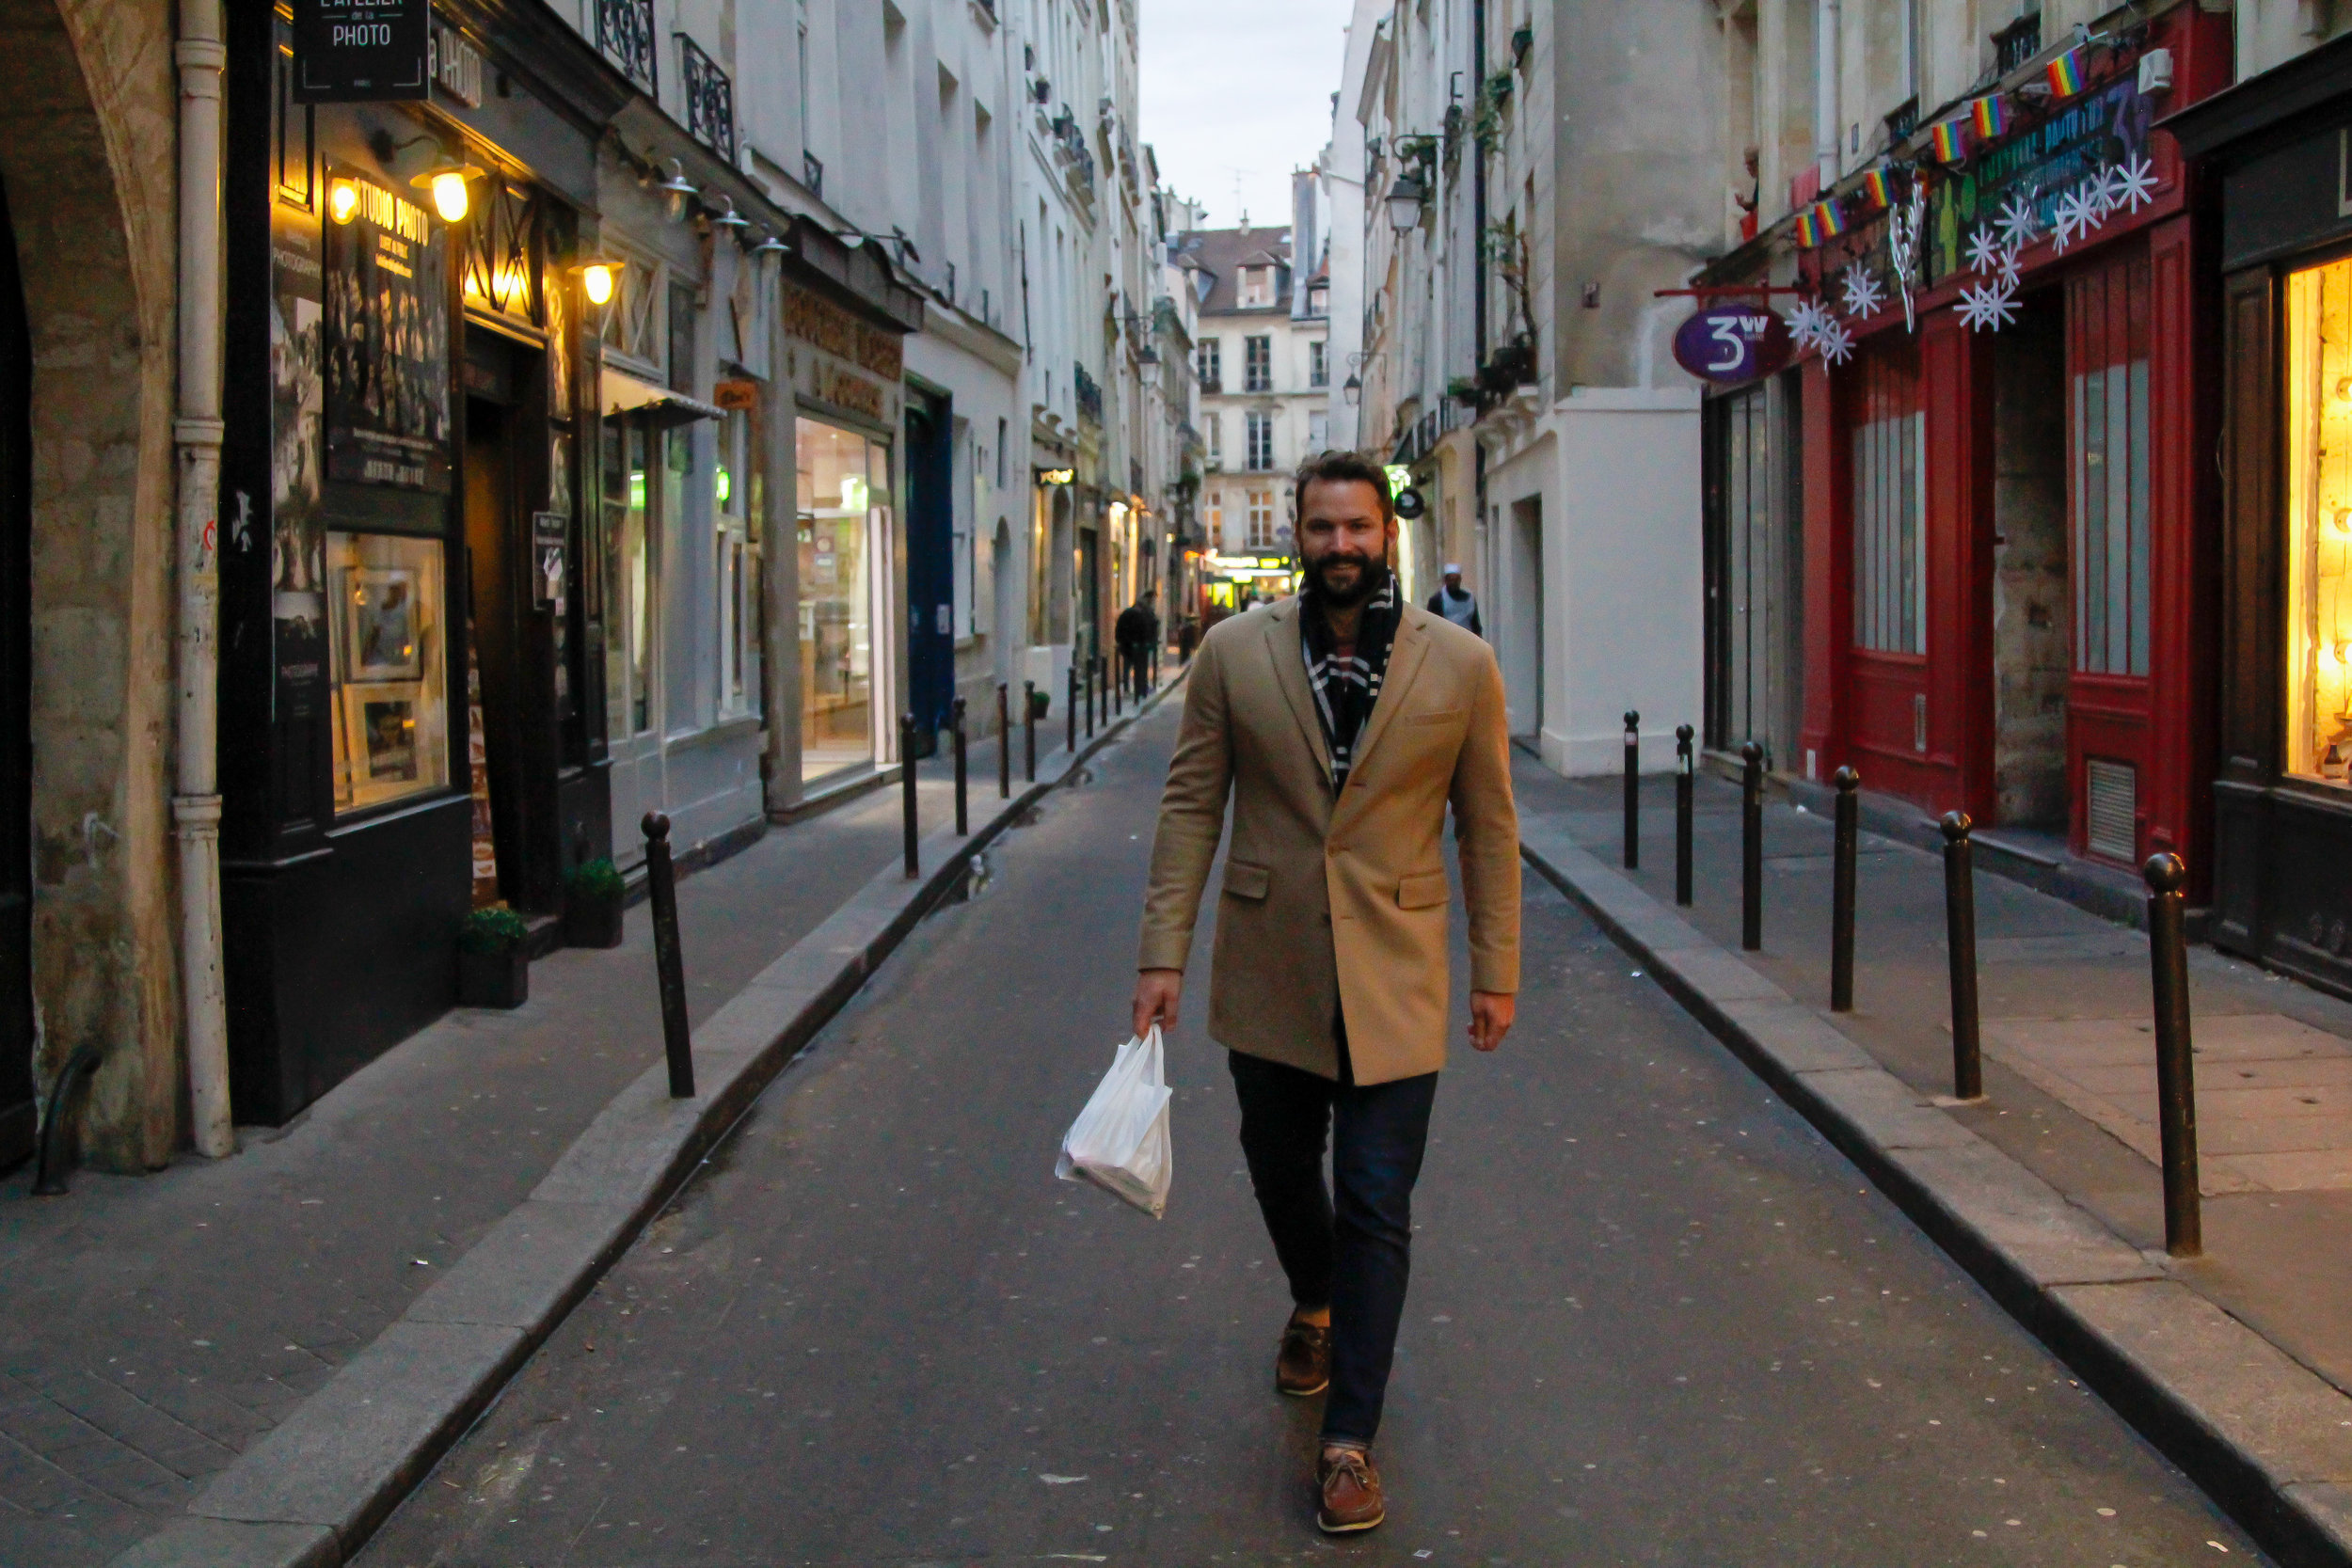 Strolling through the Marais neighborhood in Paris